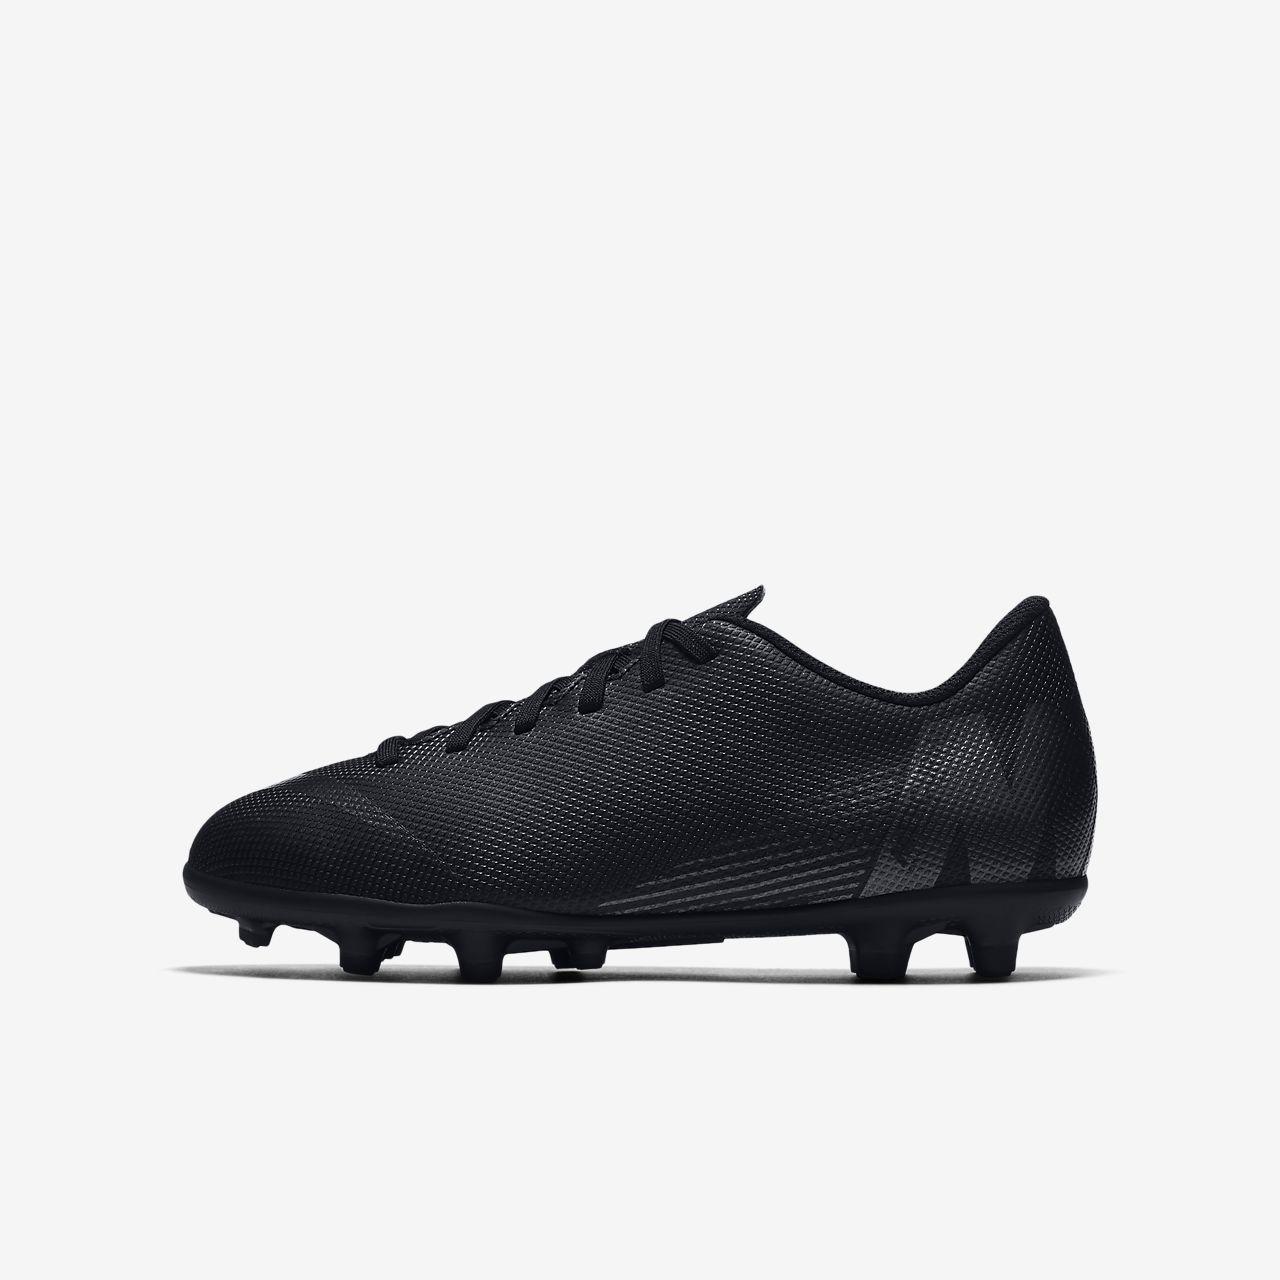 Nike Jr. Vapor 12 Club MG Botas de fútbol para múltiples superficies - Niño  c3d5bdadc7e94